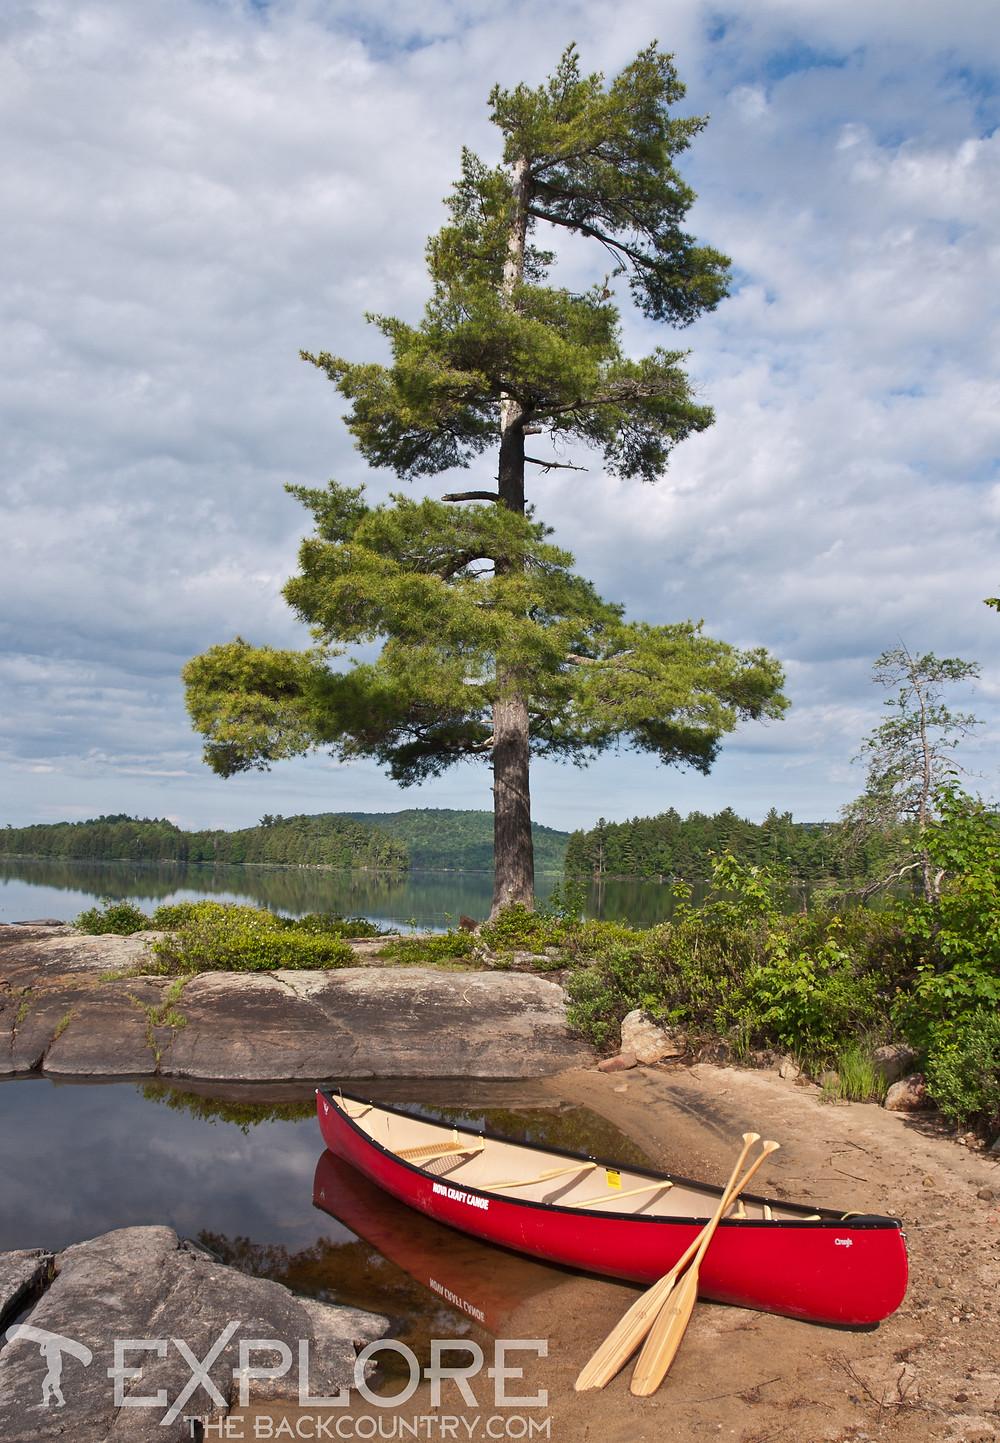 Serenity: Adirondack Park